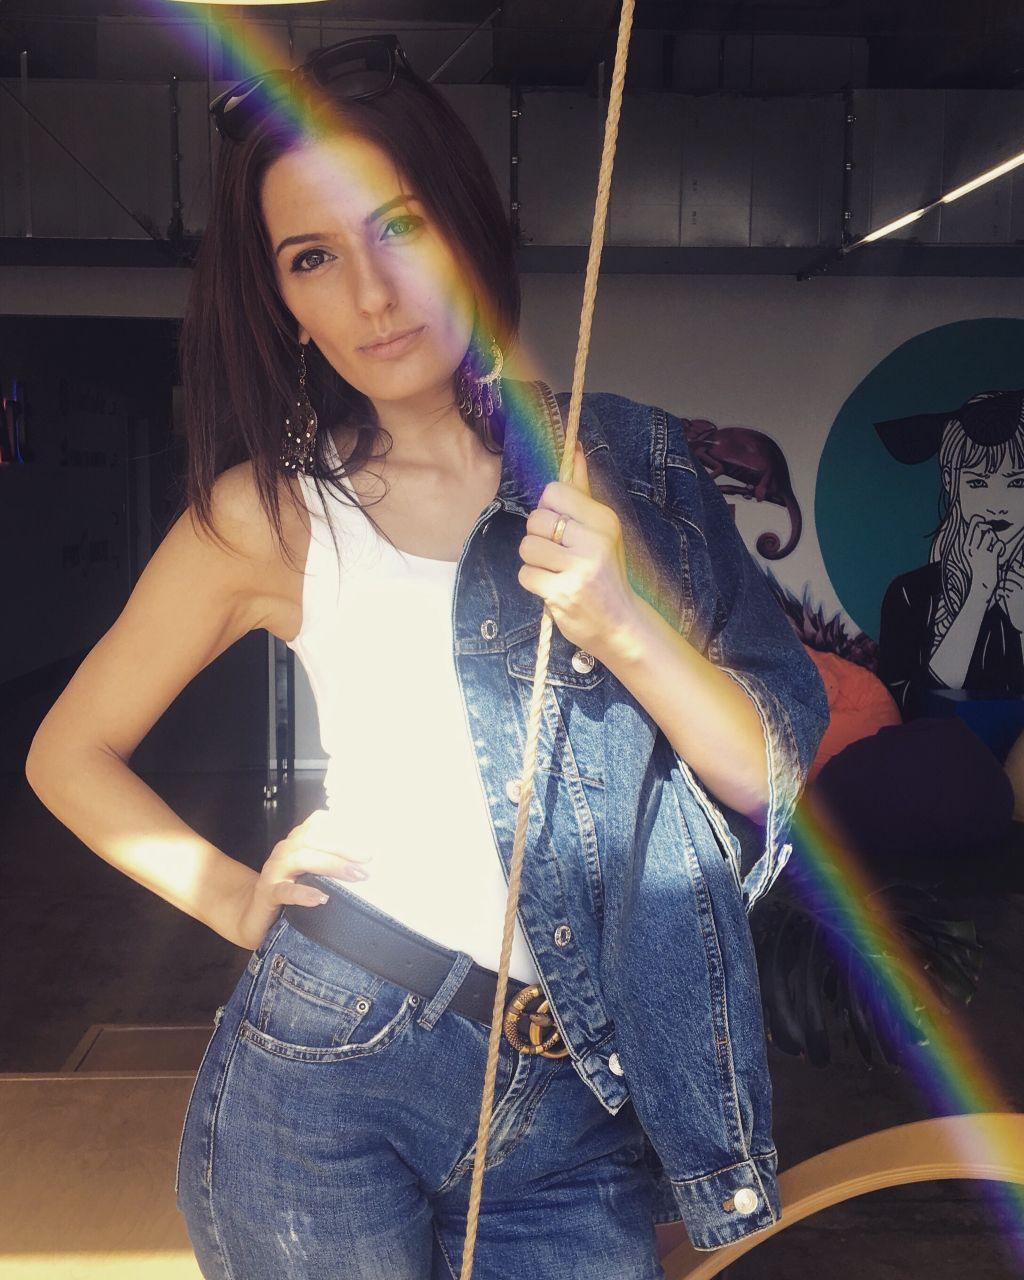 #freetoedit #MadeWithPicsArt #rainbow #rainbowbrush #edited  #photography #girl #standing #interesting